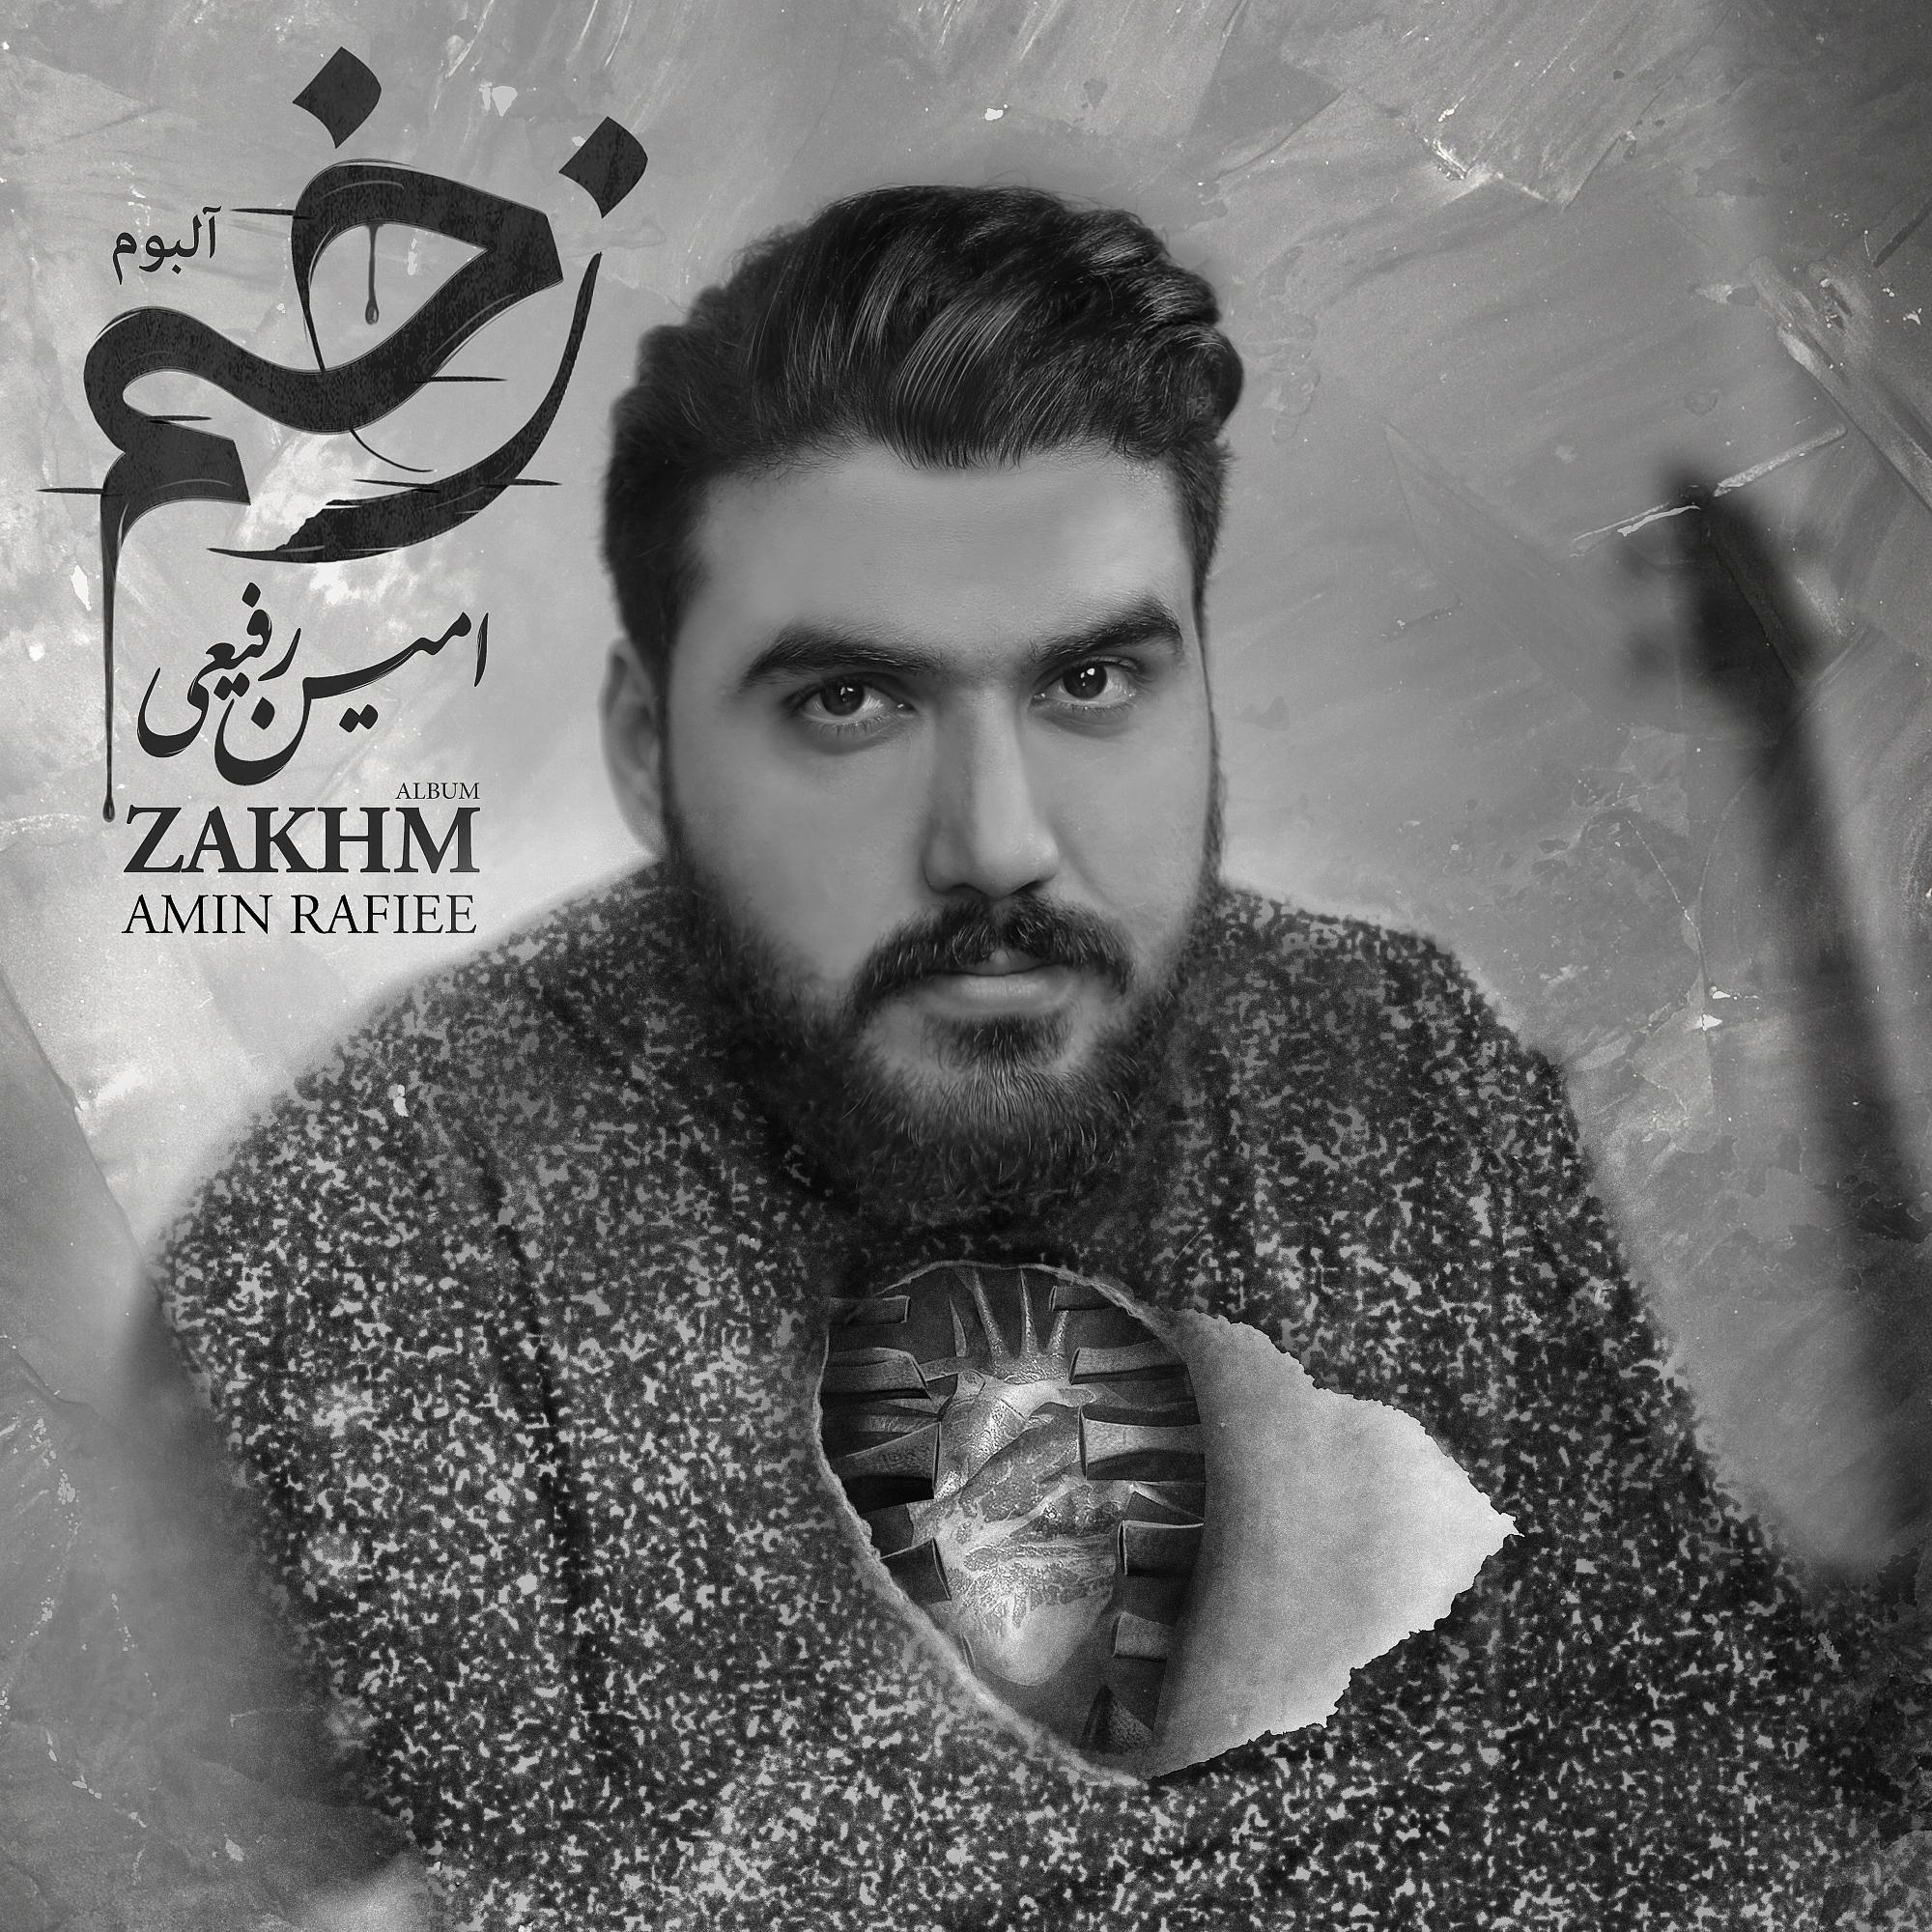 Amin Rafiee – Zakhm